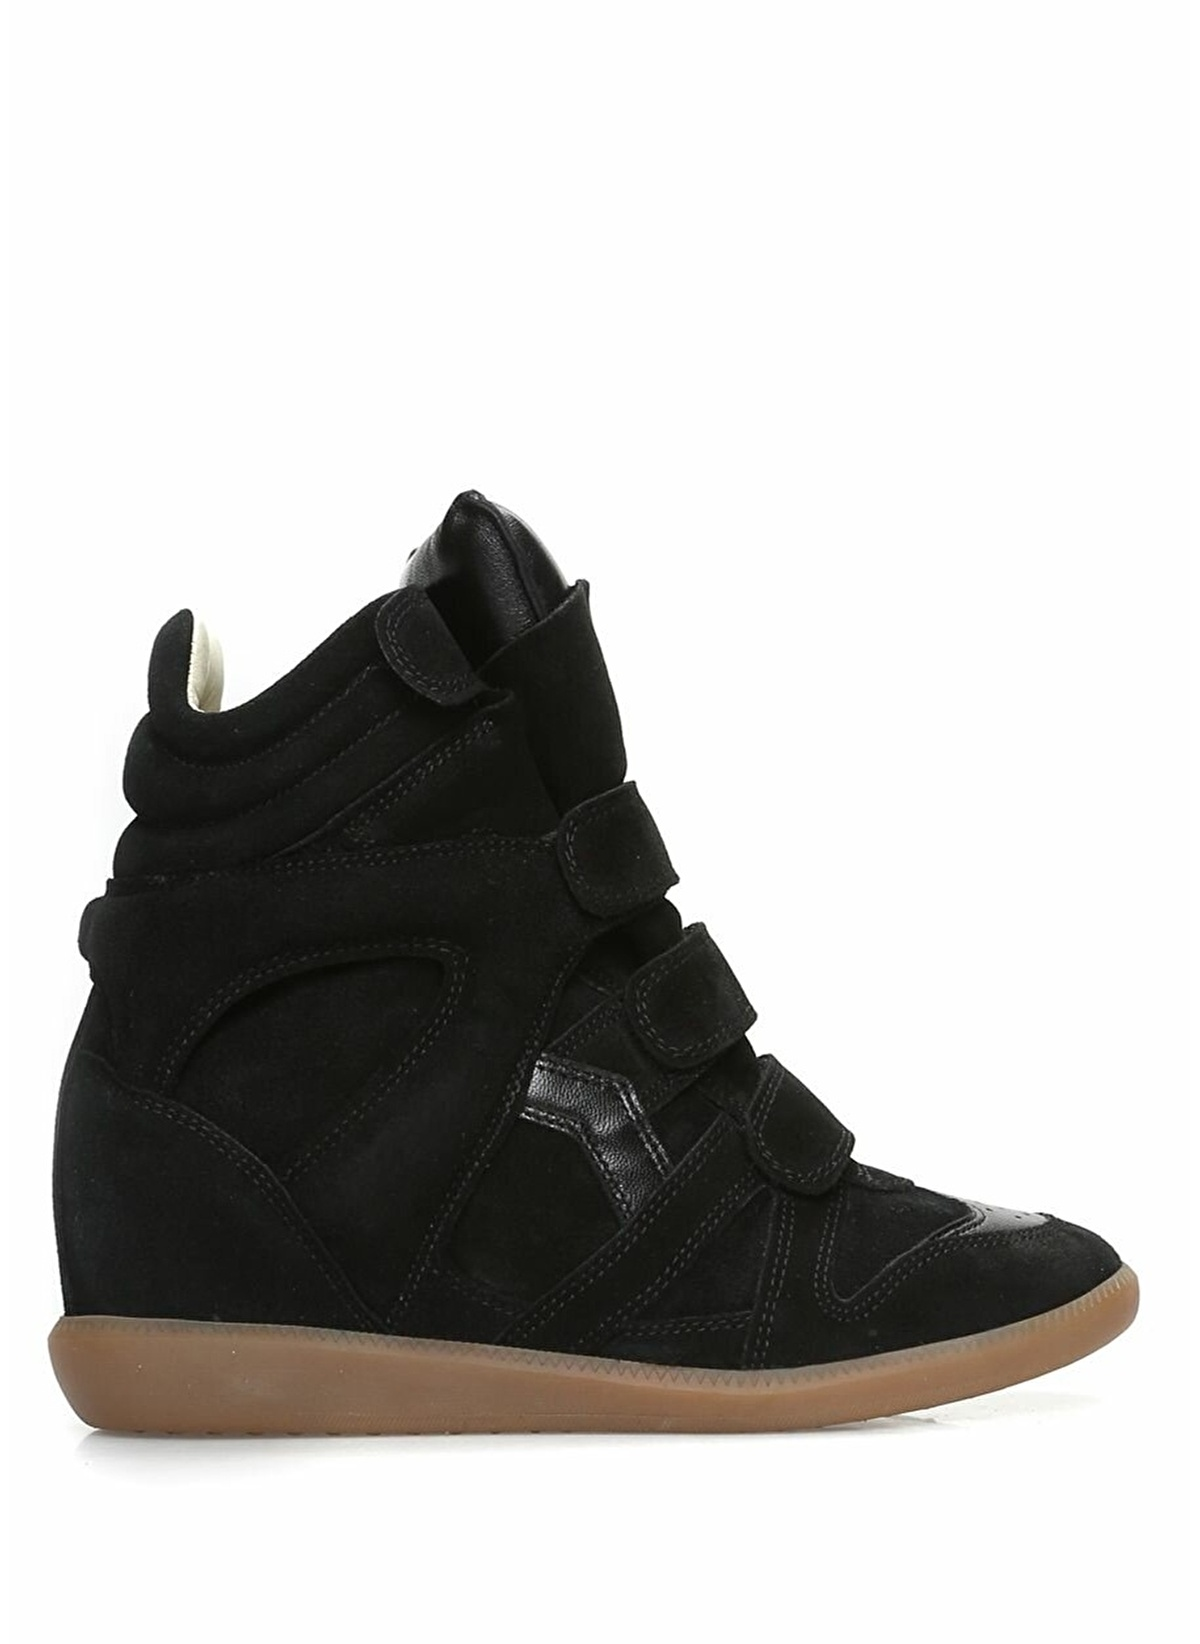 Etoile İsabel Marant Lifestyle Ayakkabı 2295.0 Tl